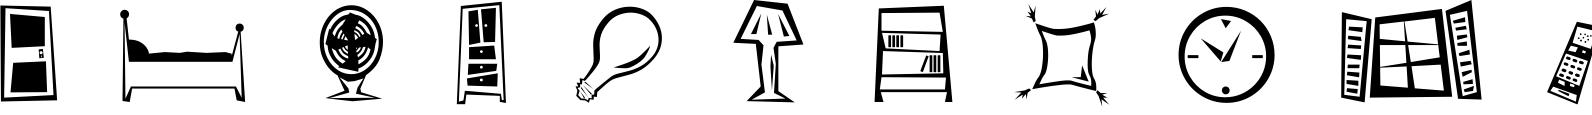 Design Font Radicals